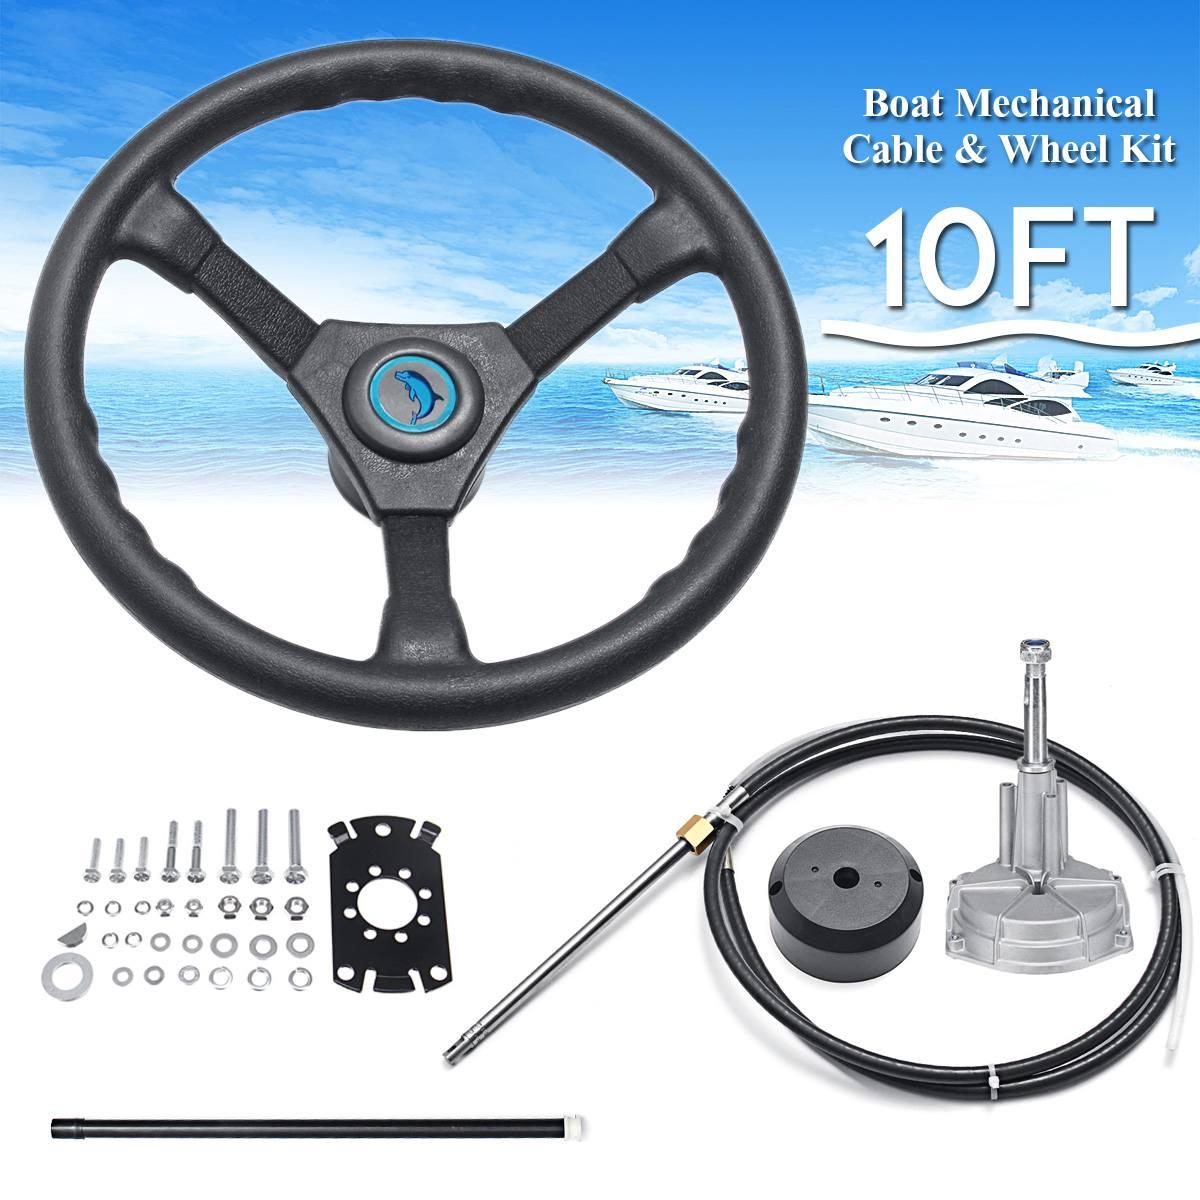 NEW 10FT Marine Engine Rotary Steering System Steering Helm  Boat Mechanical Cable & Wheel 90 Degree Bearing Bezel Kit